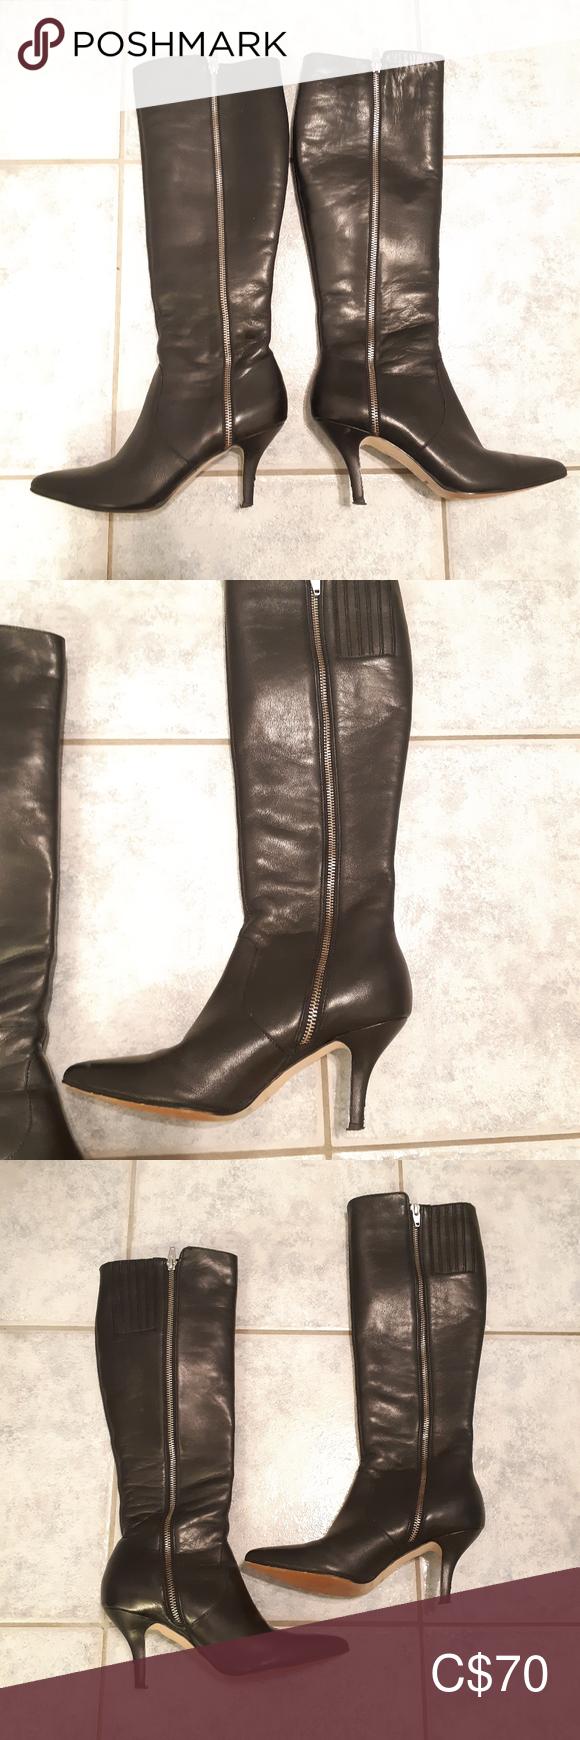 Neiman Marcus Zip Knee leather boots size 6.5 M Ne